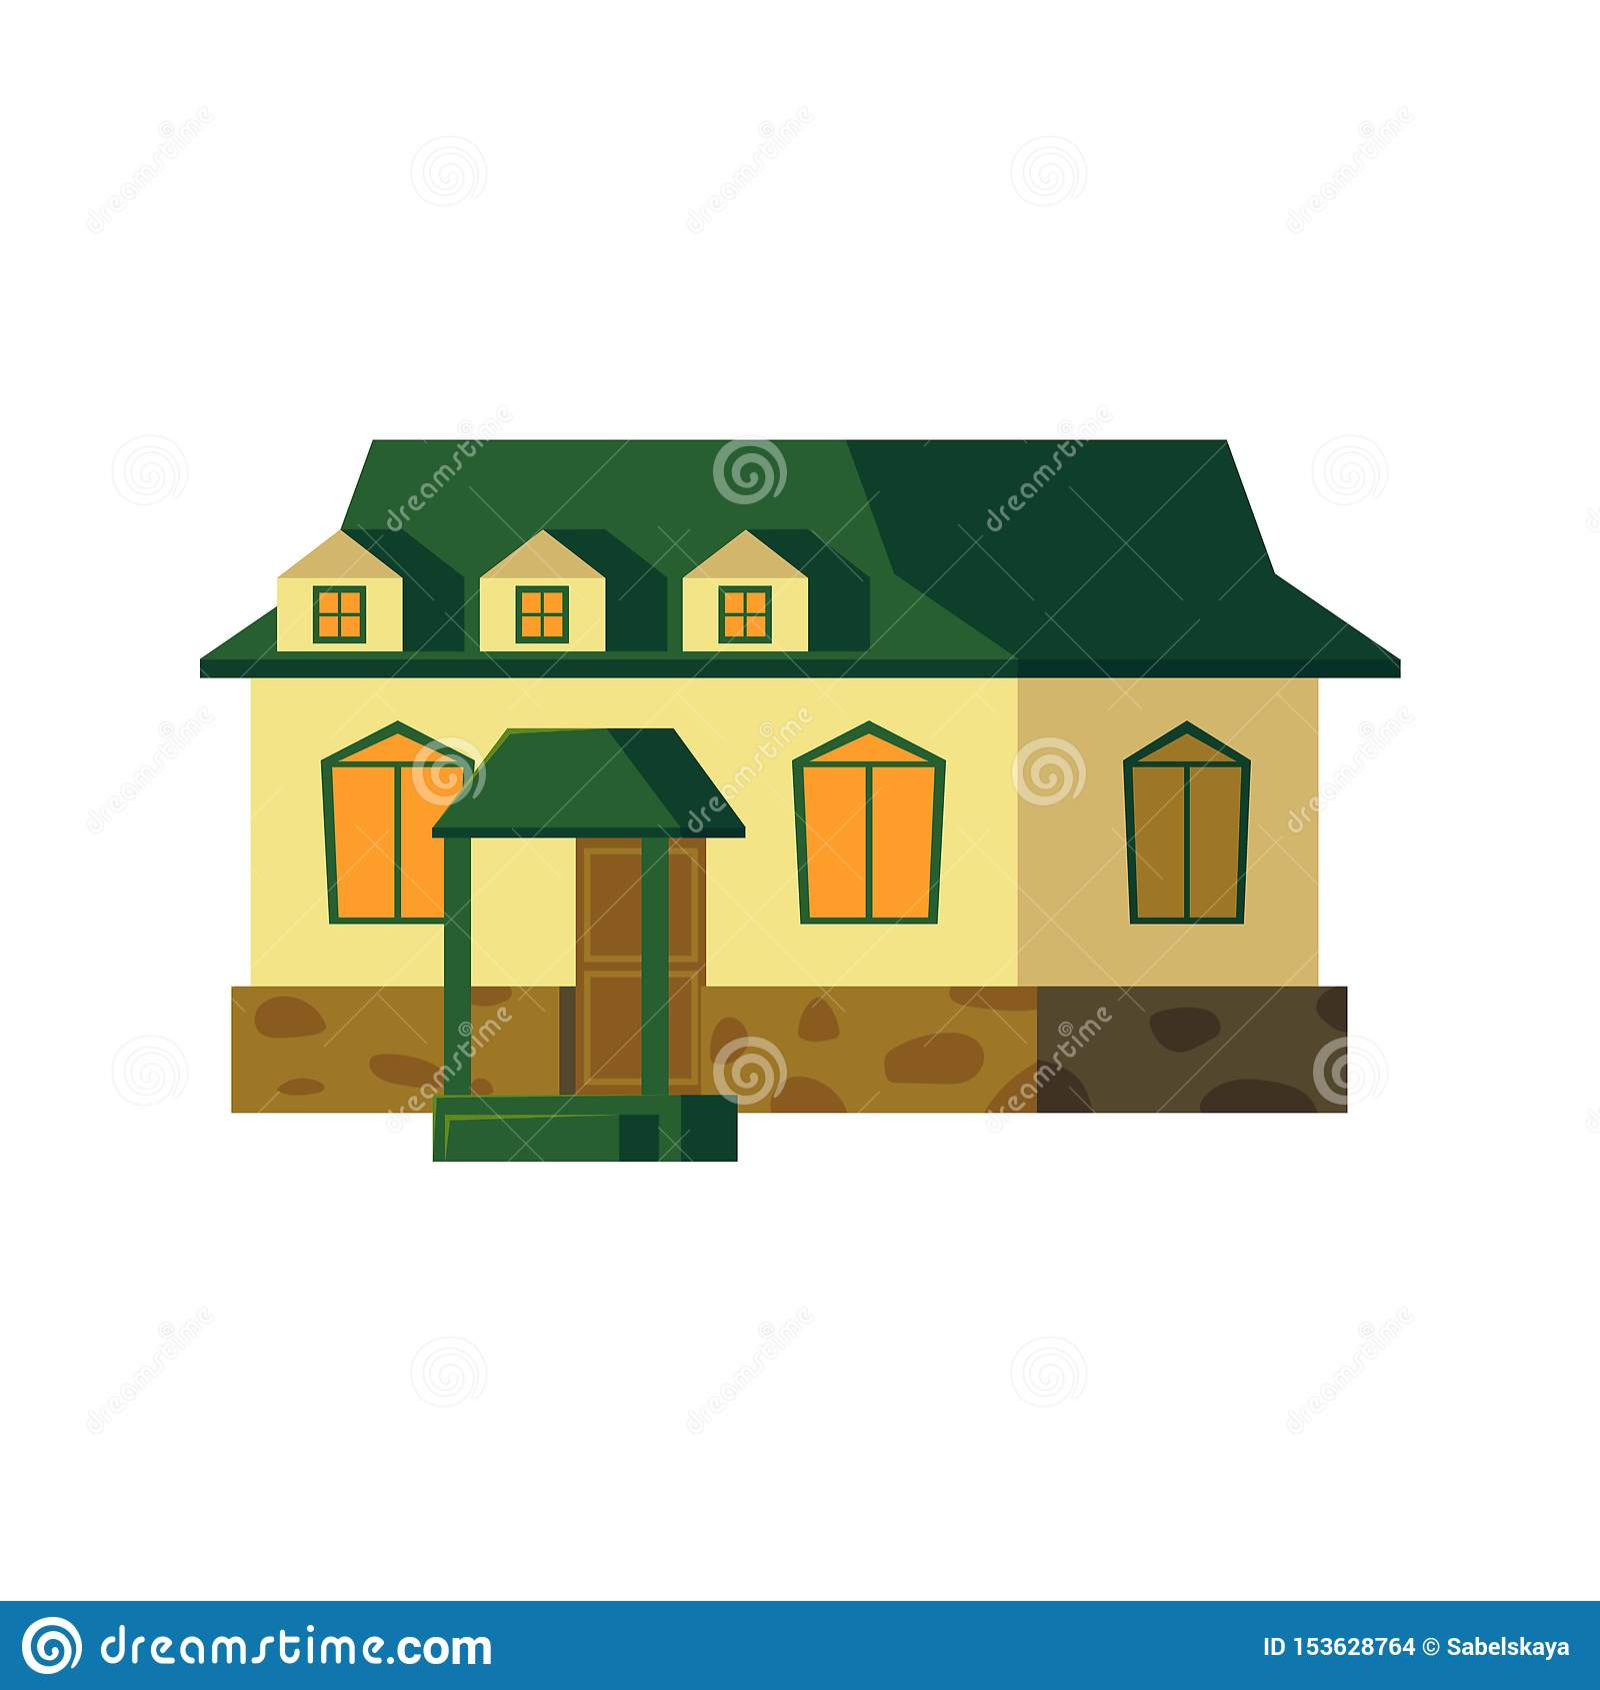 House Roof Cartoon Stock Illustrations 22 706 House Roof Cartoon Stock Illustrations Vectors Clipart Dreamstime